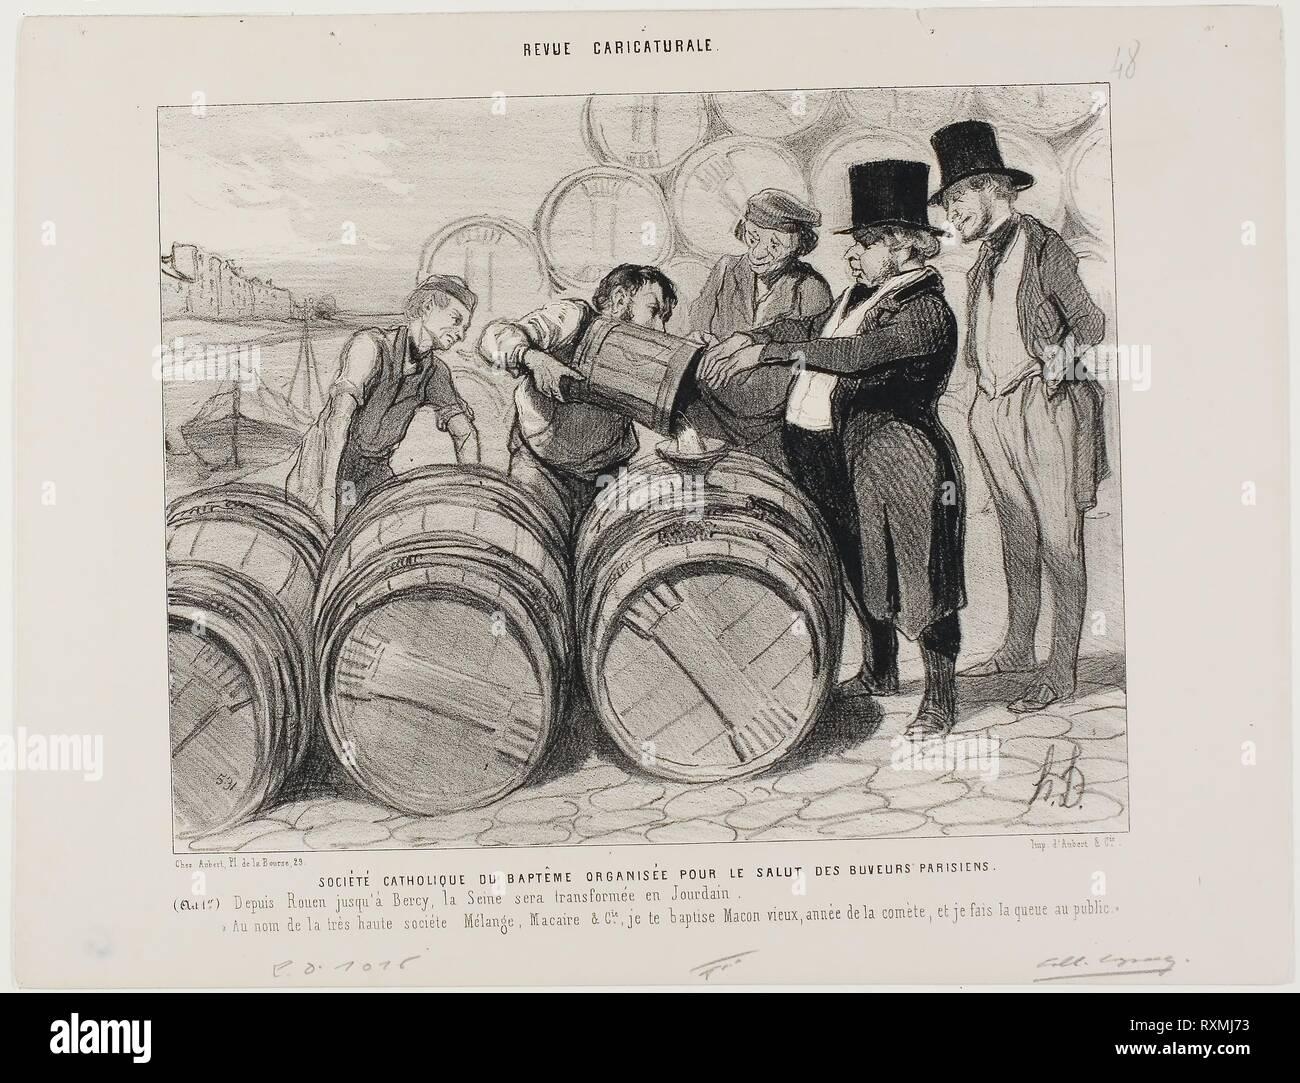 wholesale dealer 40e8e 2affa Catholic society of baptism established for all the drunkards of Paris.  (Article 1)